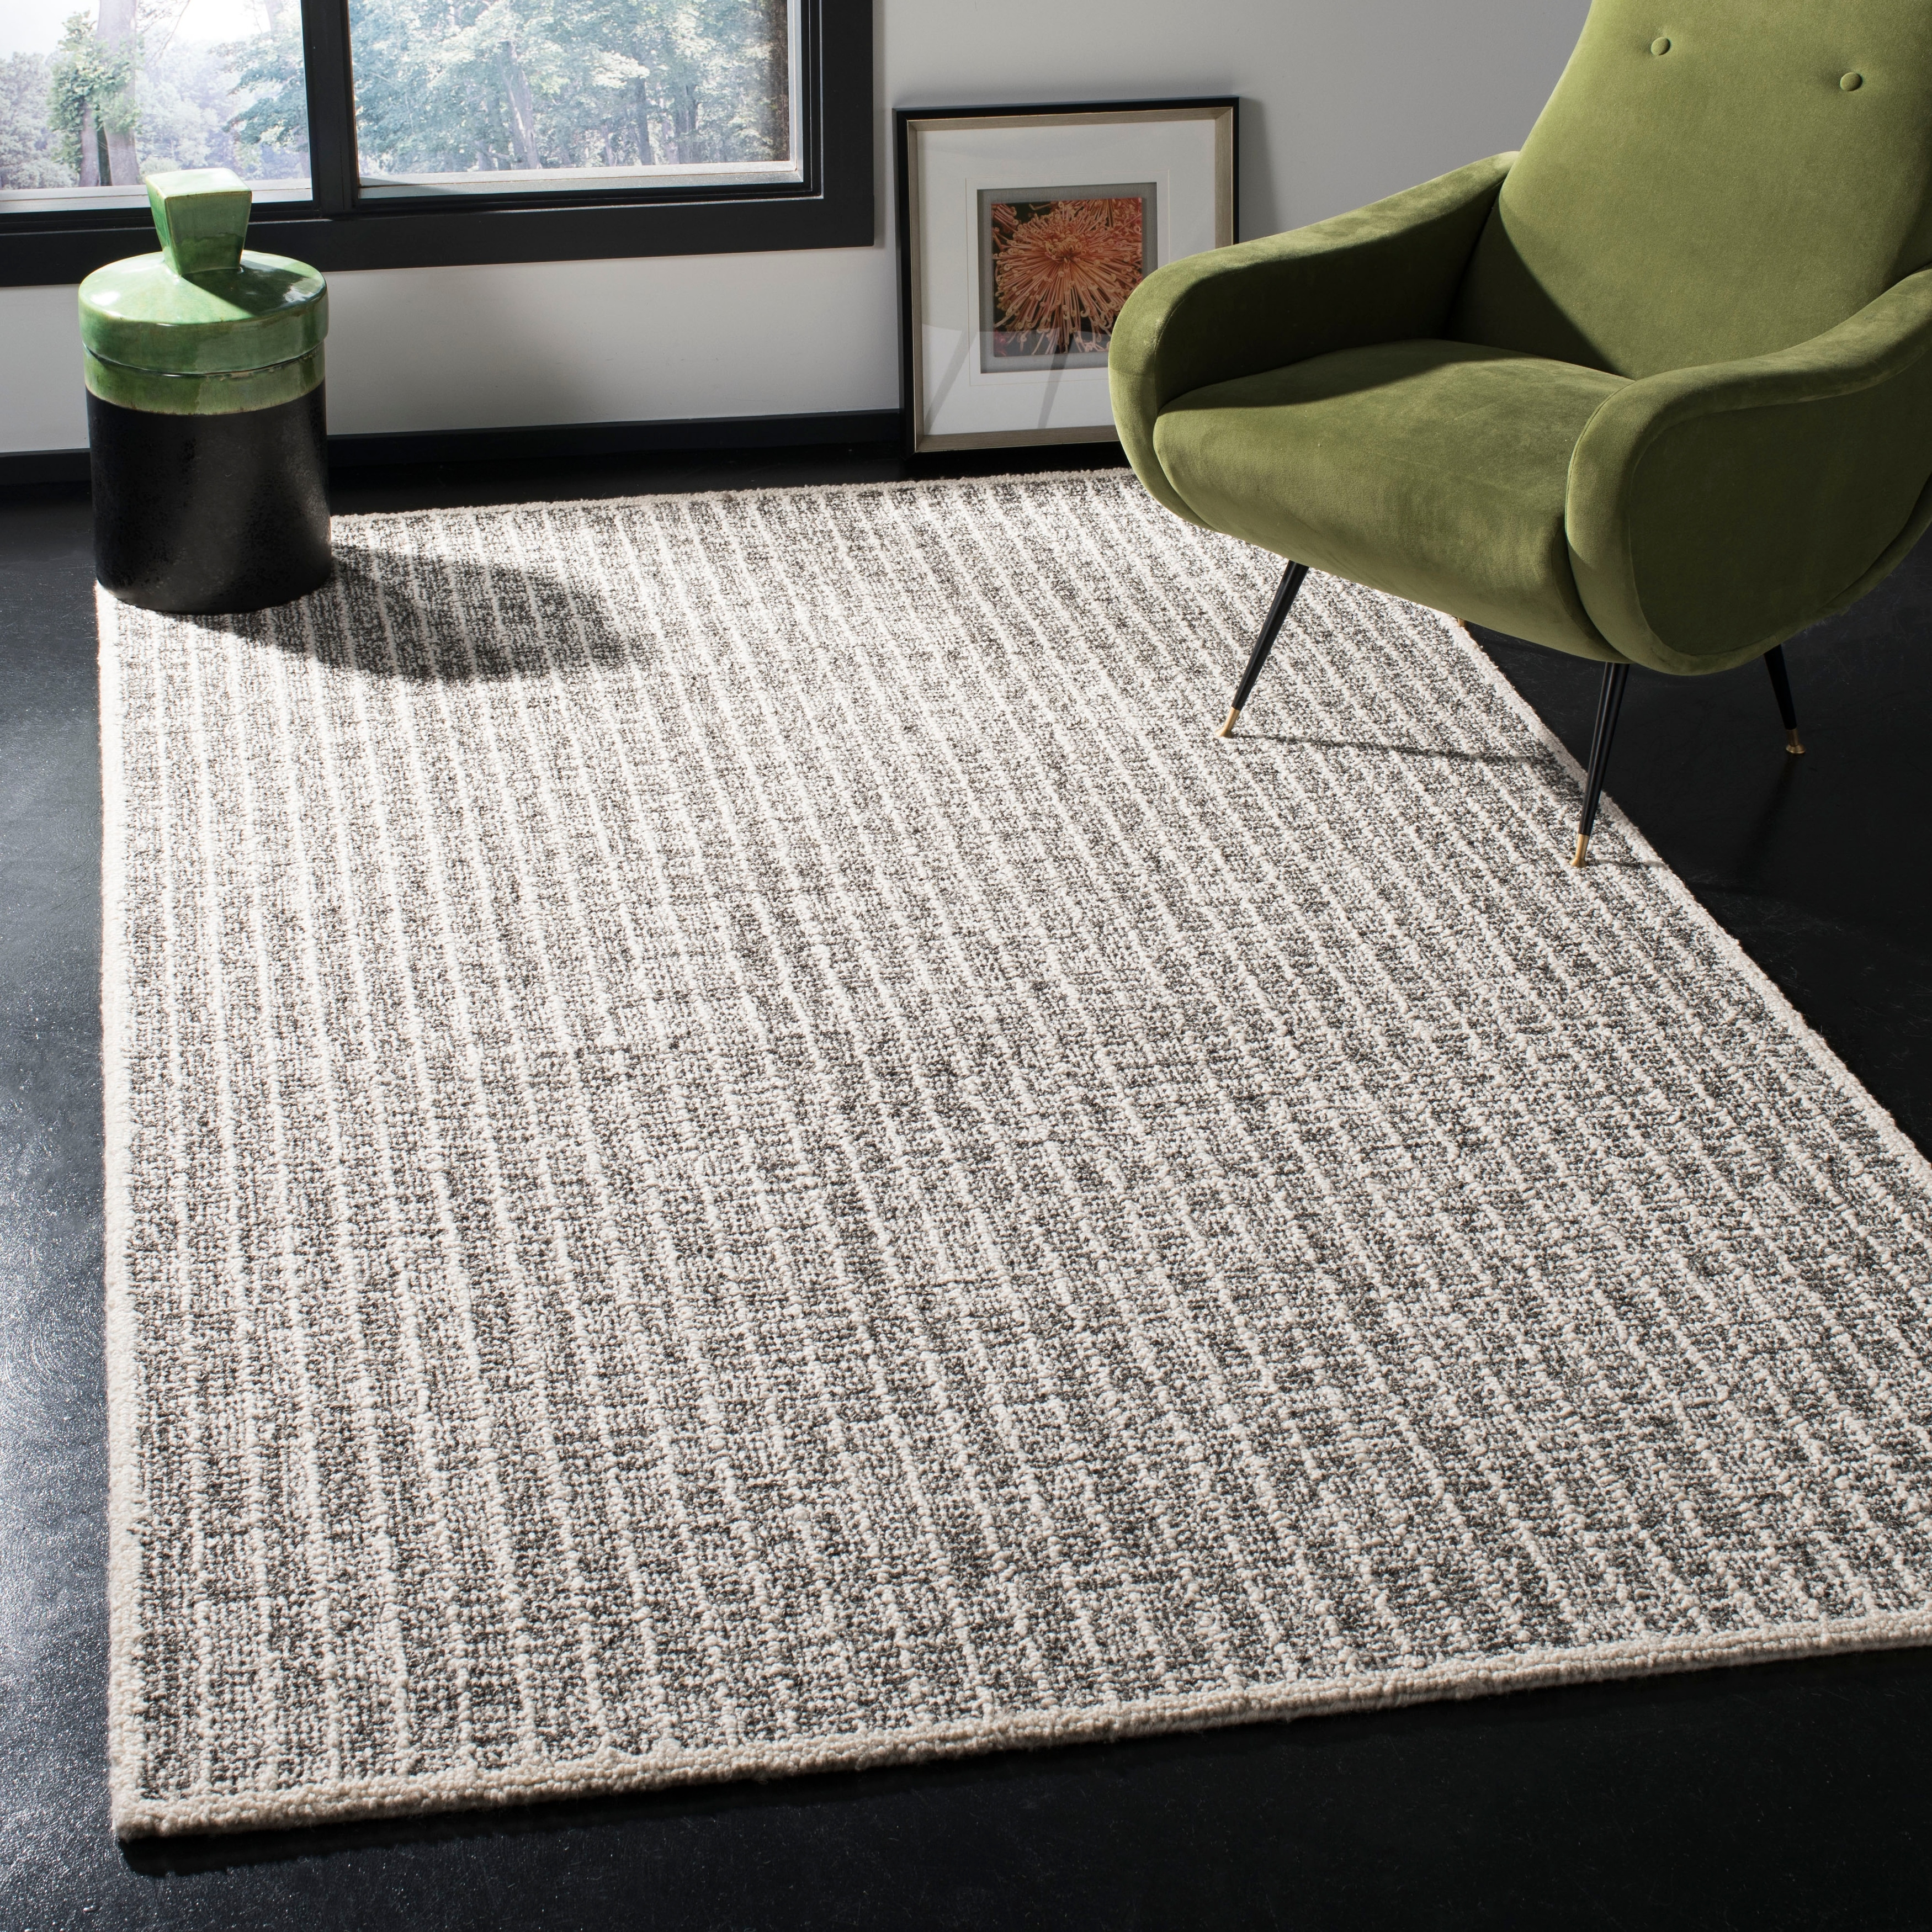 Safavieh Handmade Abstract Luella Modern Wool Rug Overstock 22718415 6 X 6 Round Ivory Black